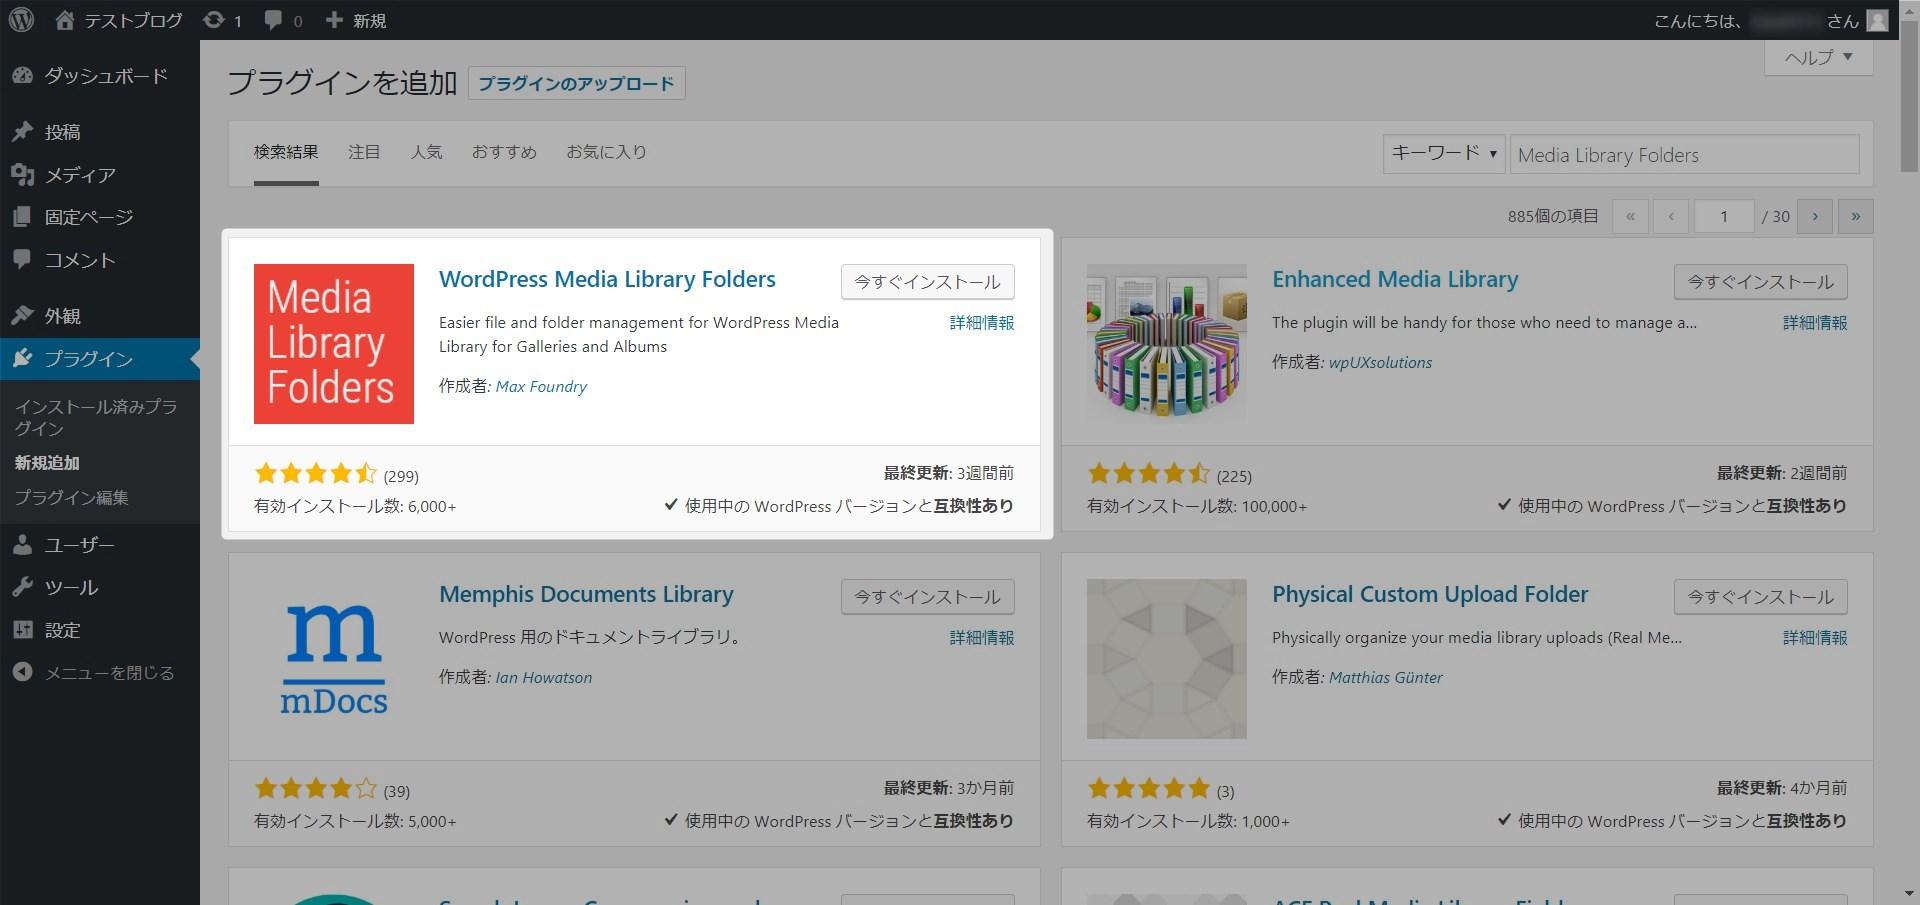 Media Library Folders